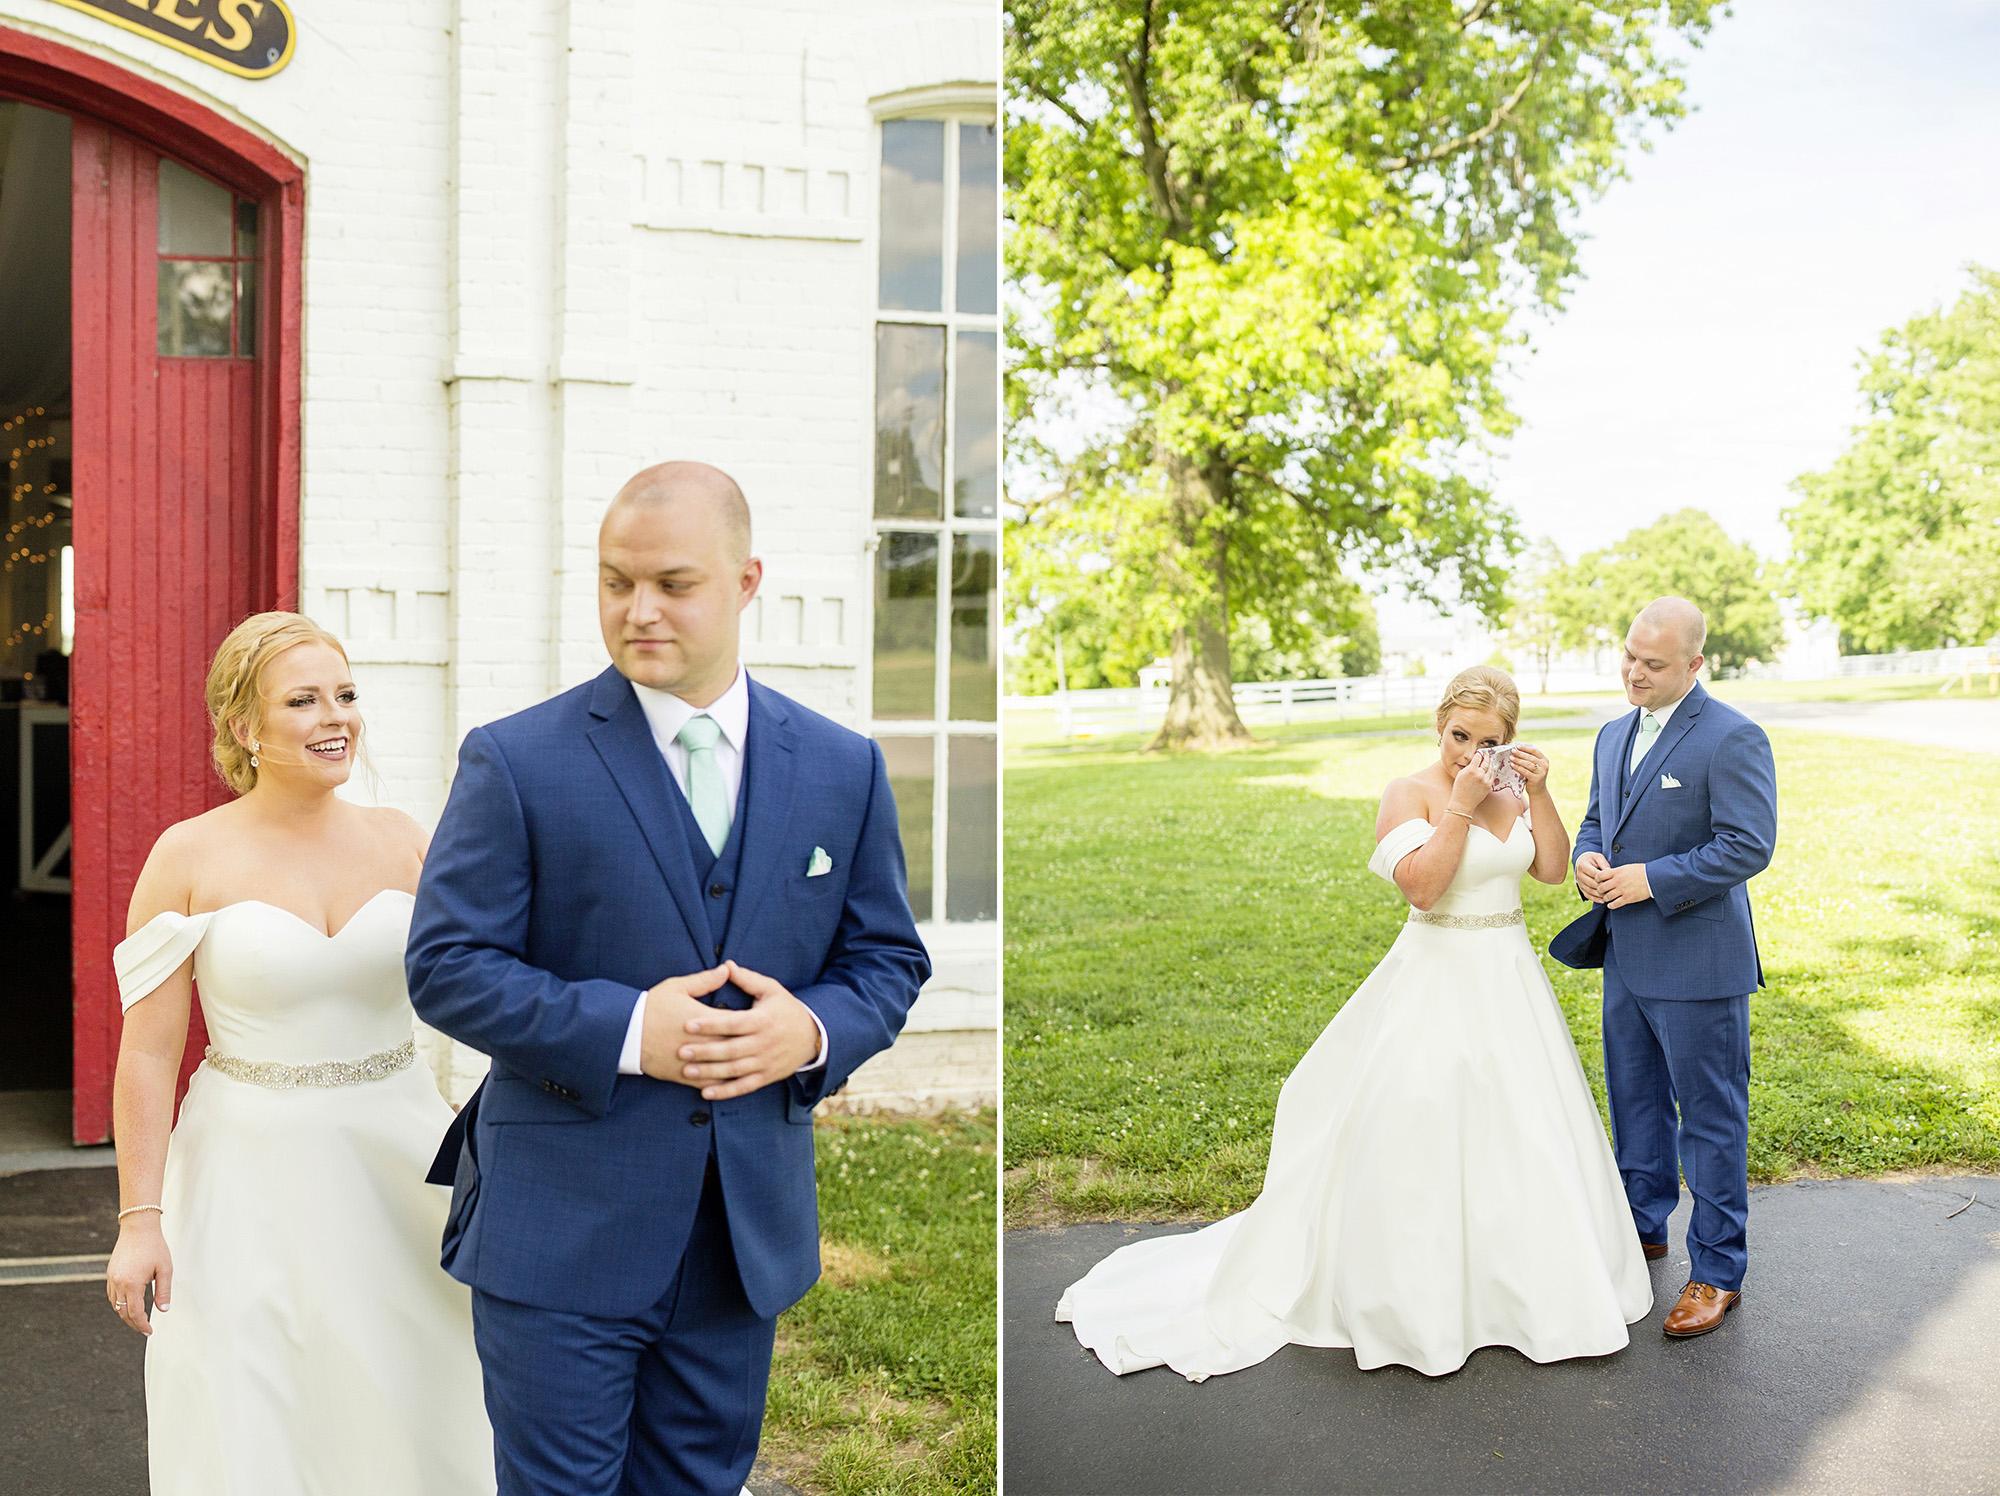 Seriously_Sabrina_Photography_Lexington_Kentucky_Pax_Christi_Round_Barn_Wedding_Beath_30.jpg